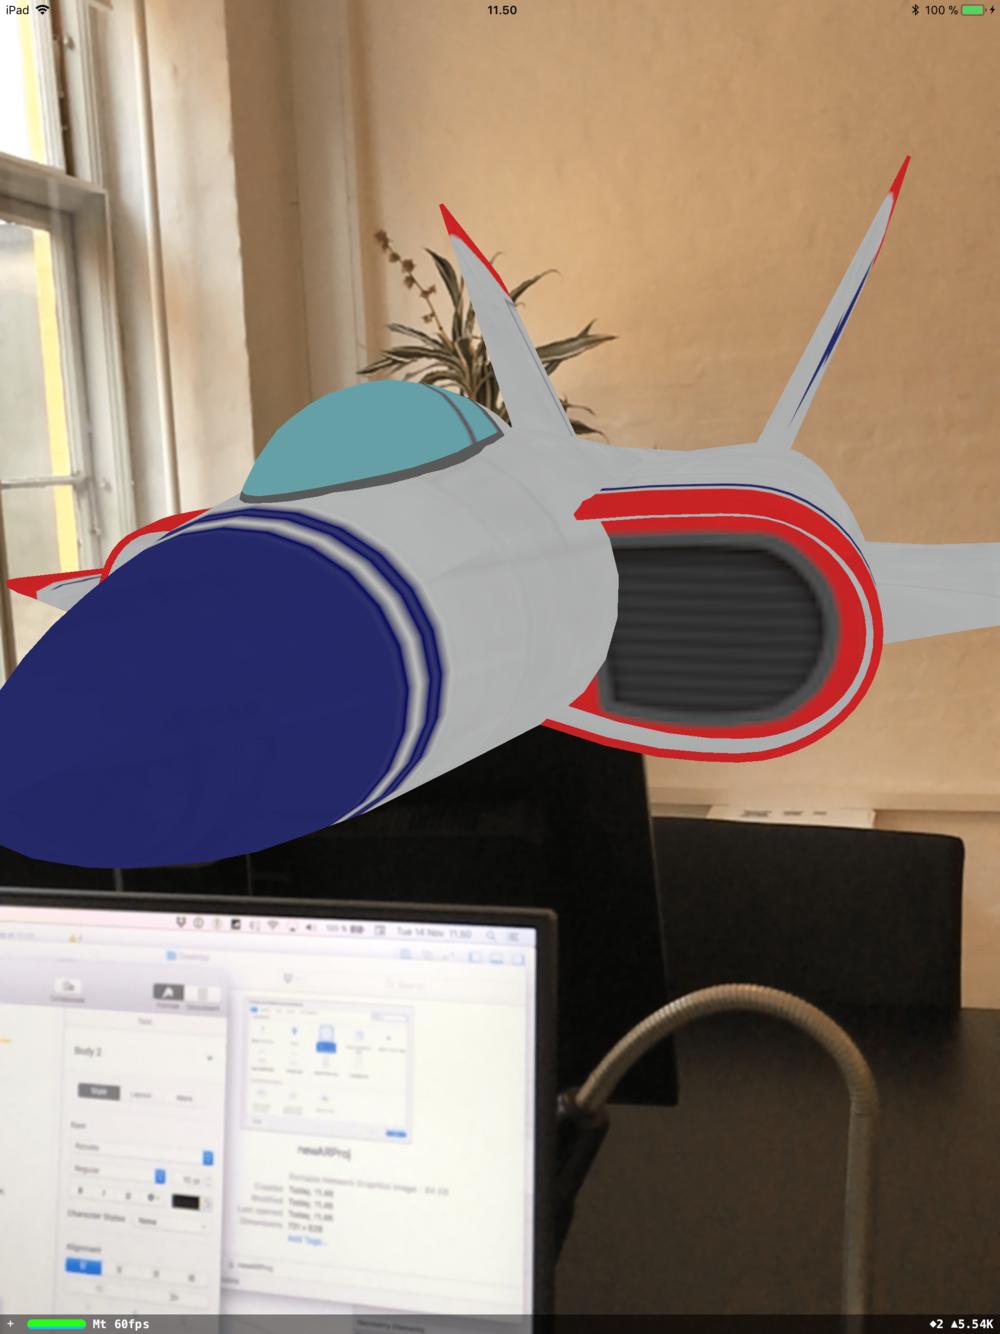 Augmented Reality svævefly lavet i Apple iOS ARKit demo projekt.